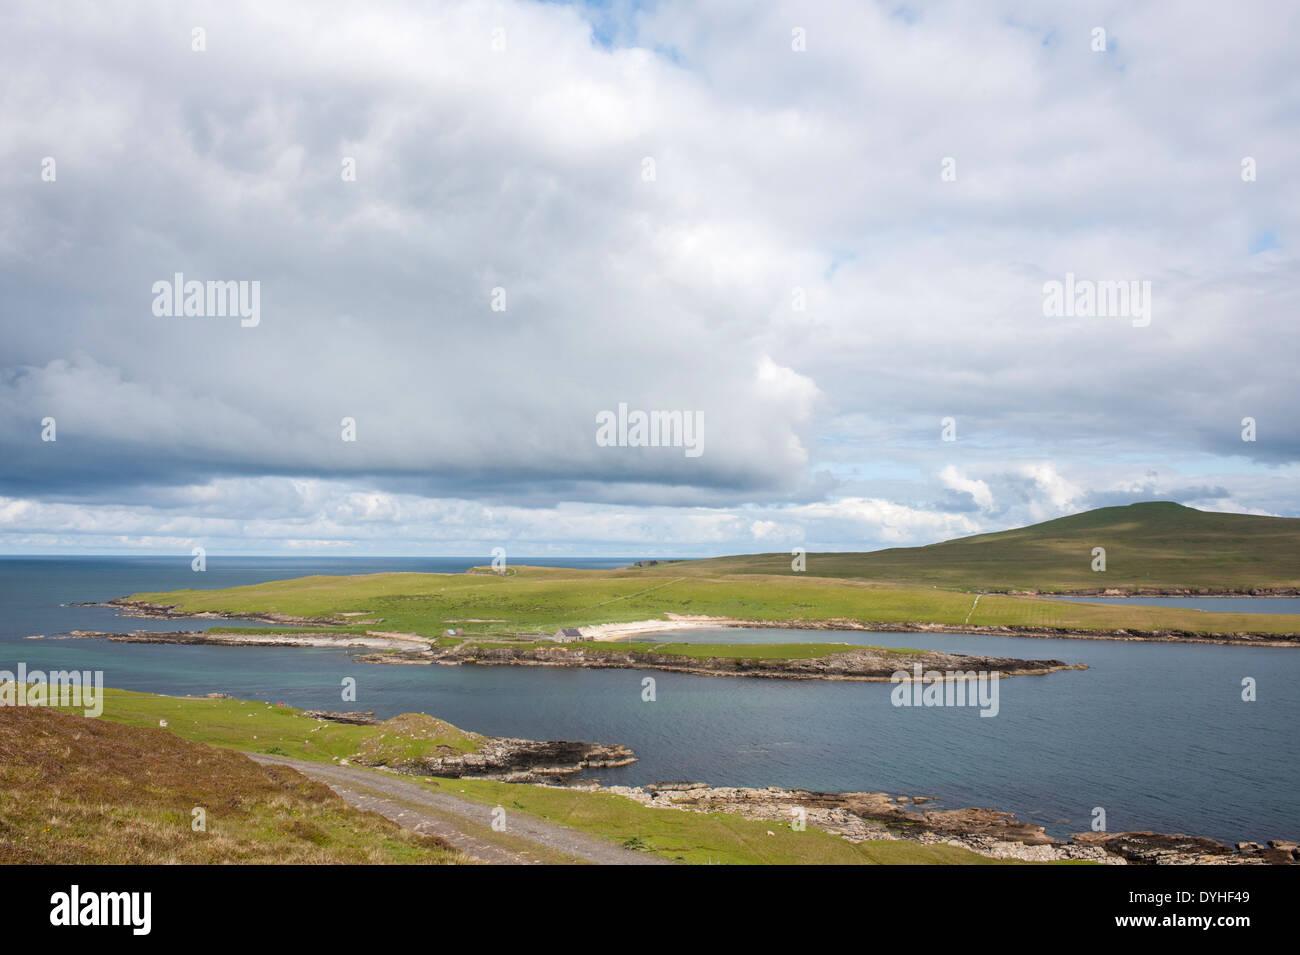 Isle of Noss, Shetland Isles, Scotland, UK - Stock Image